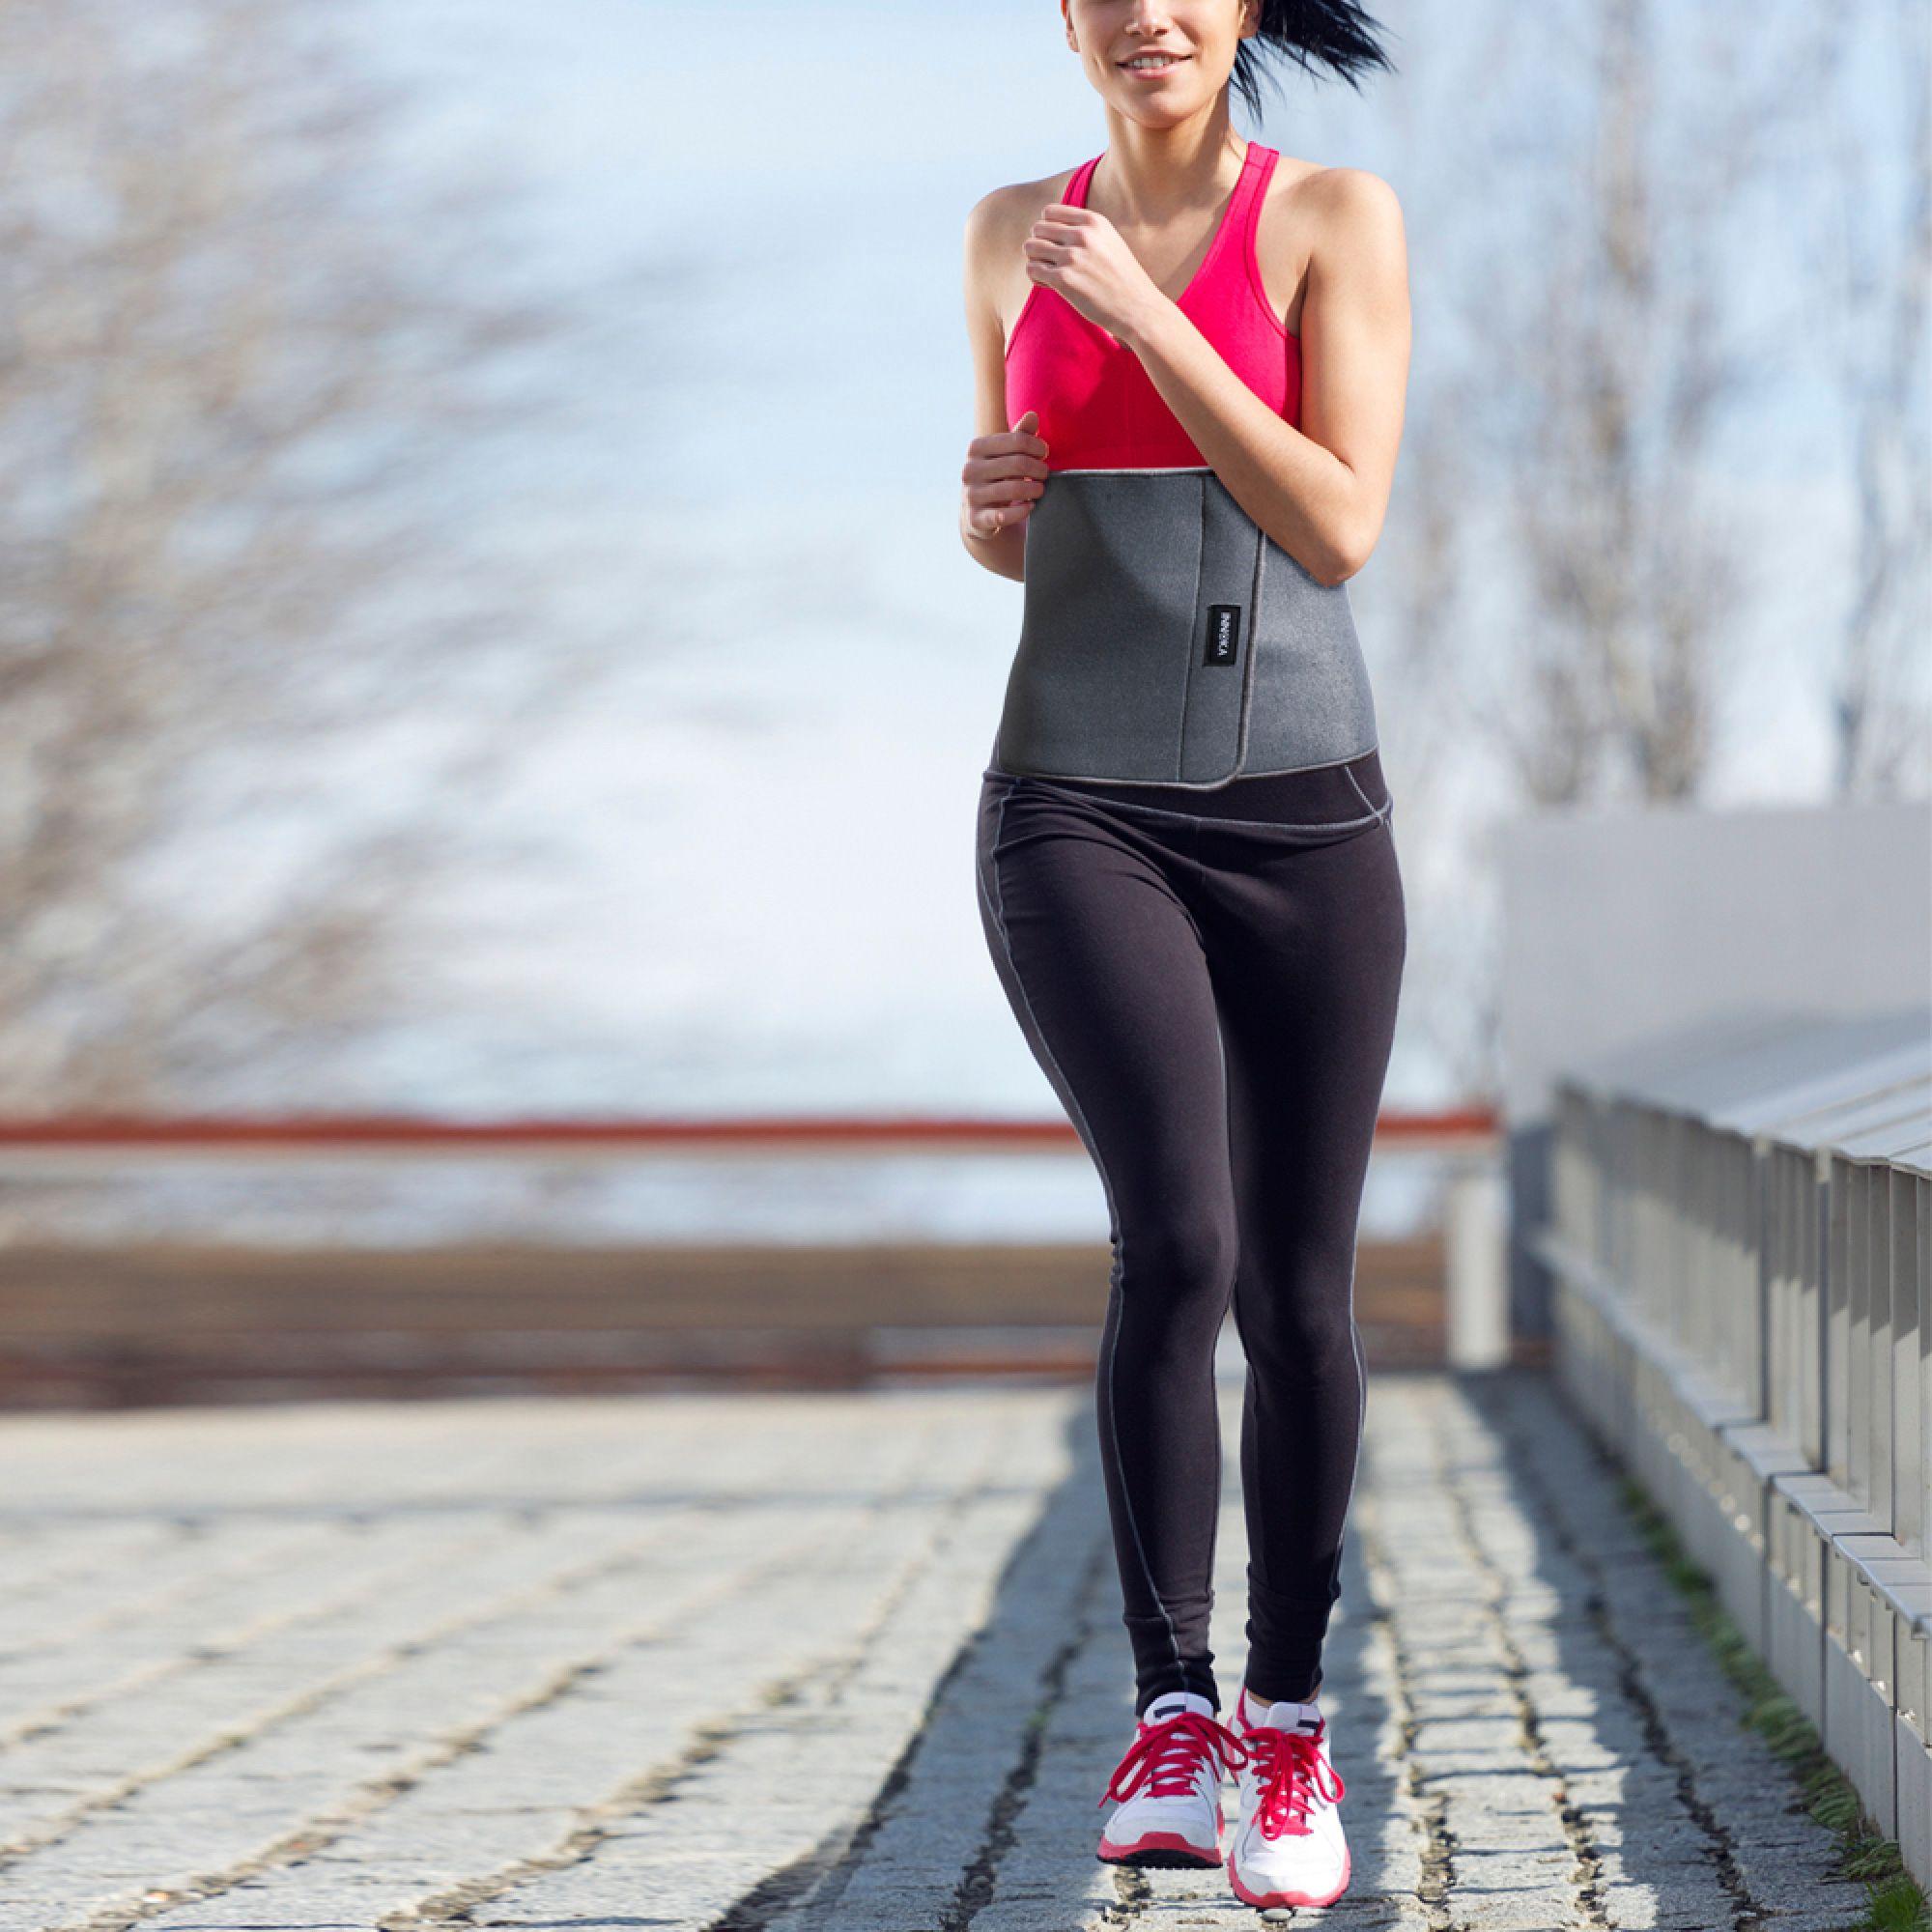 0d2a51f14eb INNOKA Fat Burning Waist Trimmer Gym Running Exercise Wrap Belt Shapewear  Sweat Weight Loss Body Shaper - Grey - Walmart.com